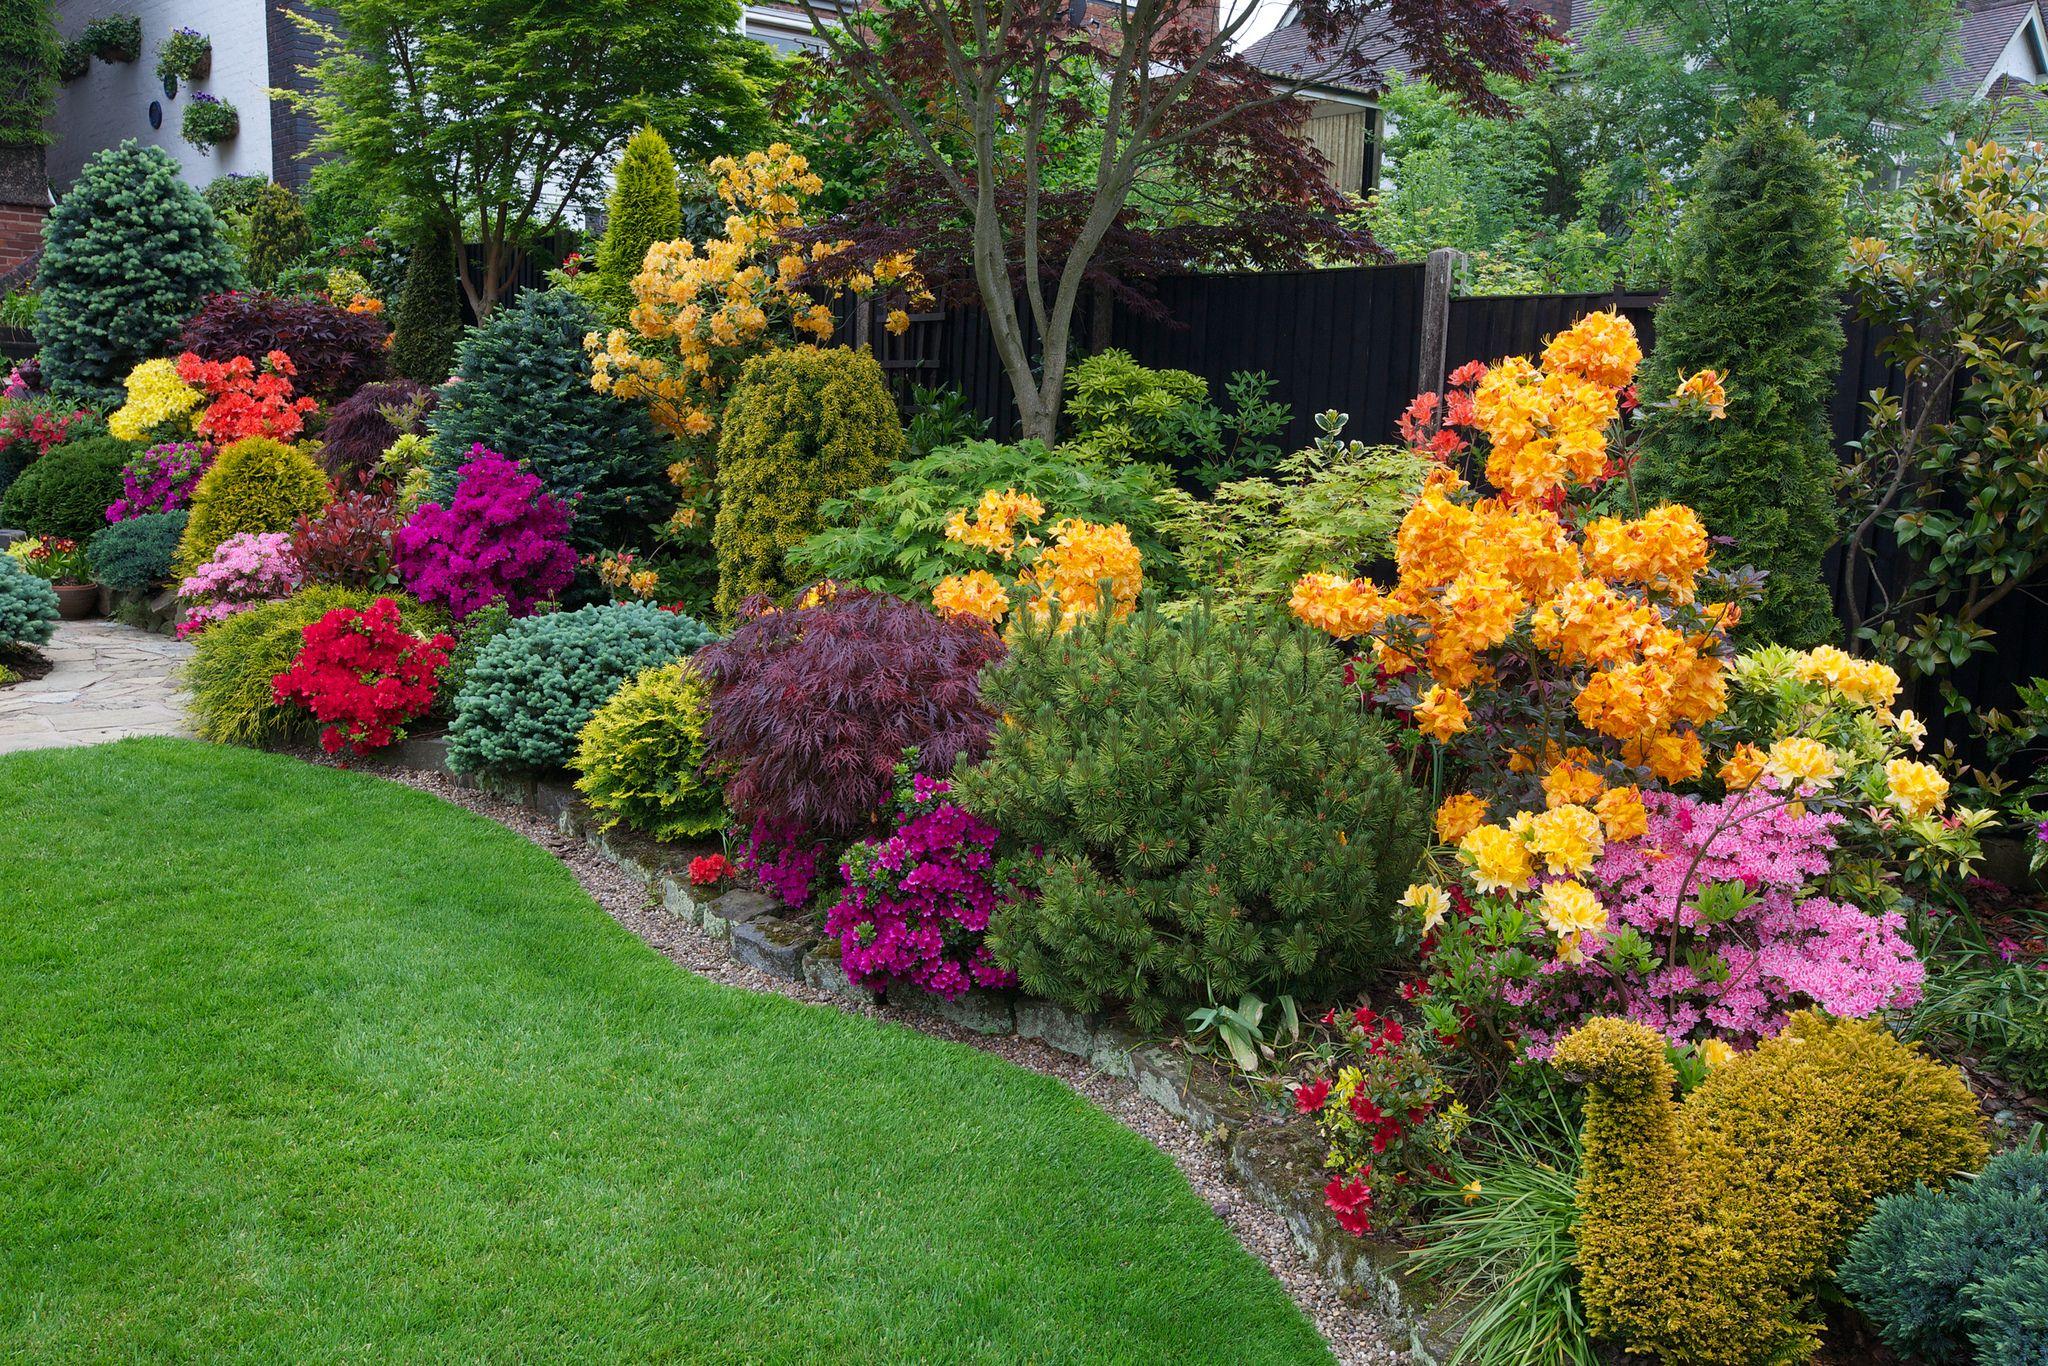 Fiori Tappezzanti Per Aiuole side border late spring azalea flowers | idee giardino